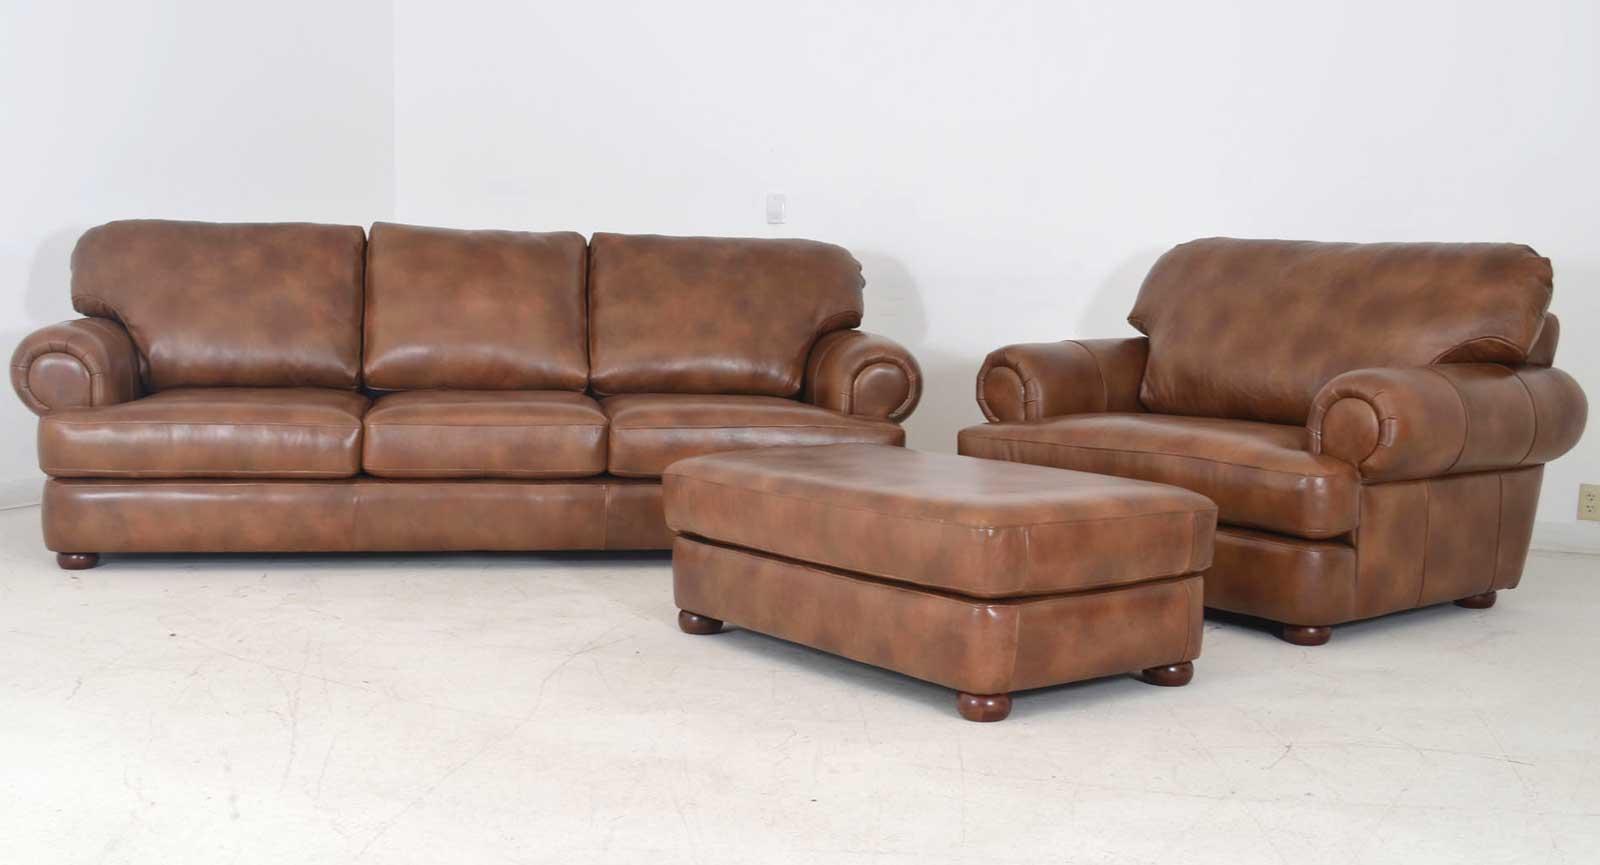 Charmant Three Seat Sofa Chair And Half Ottoman B